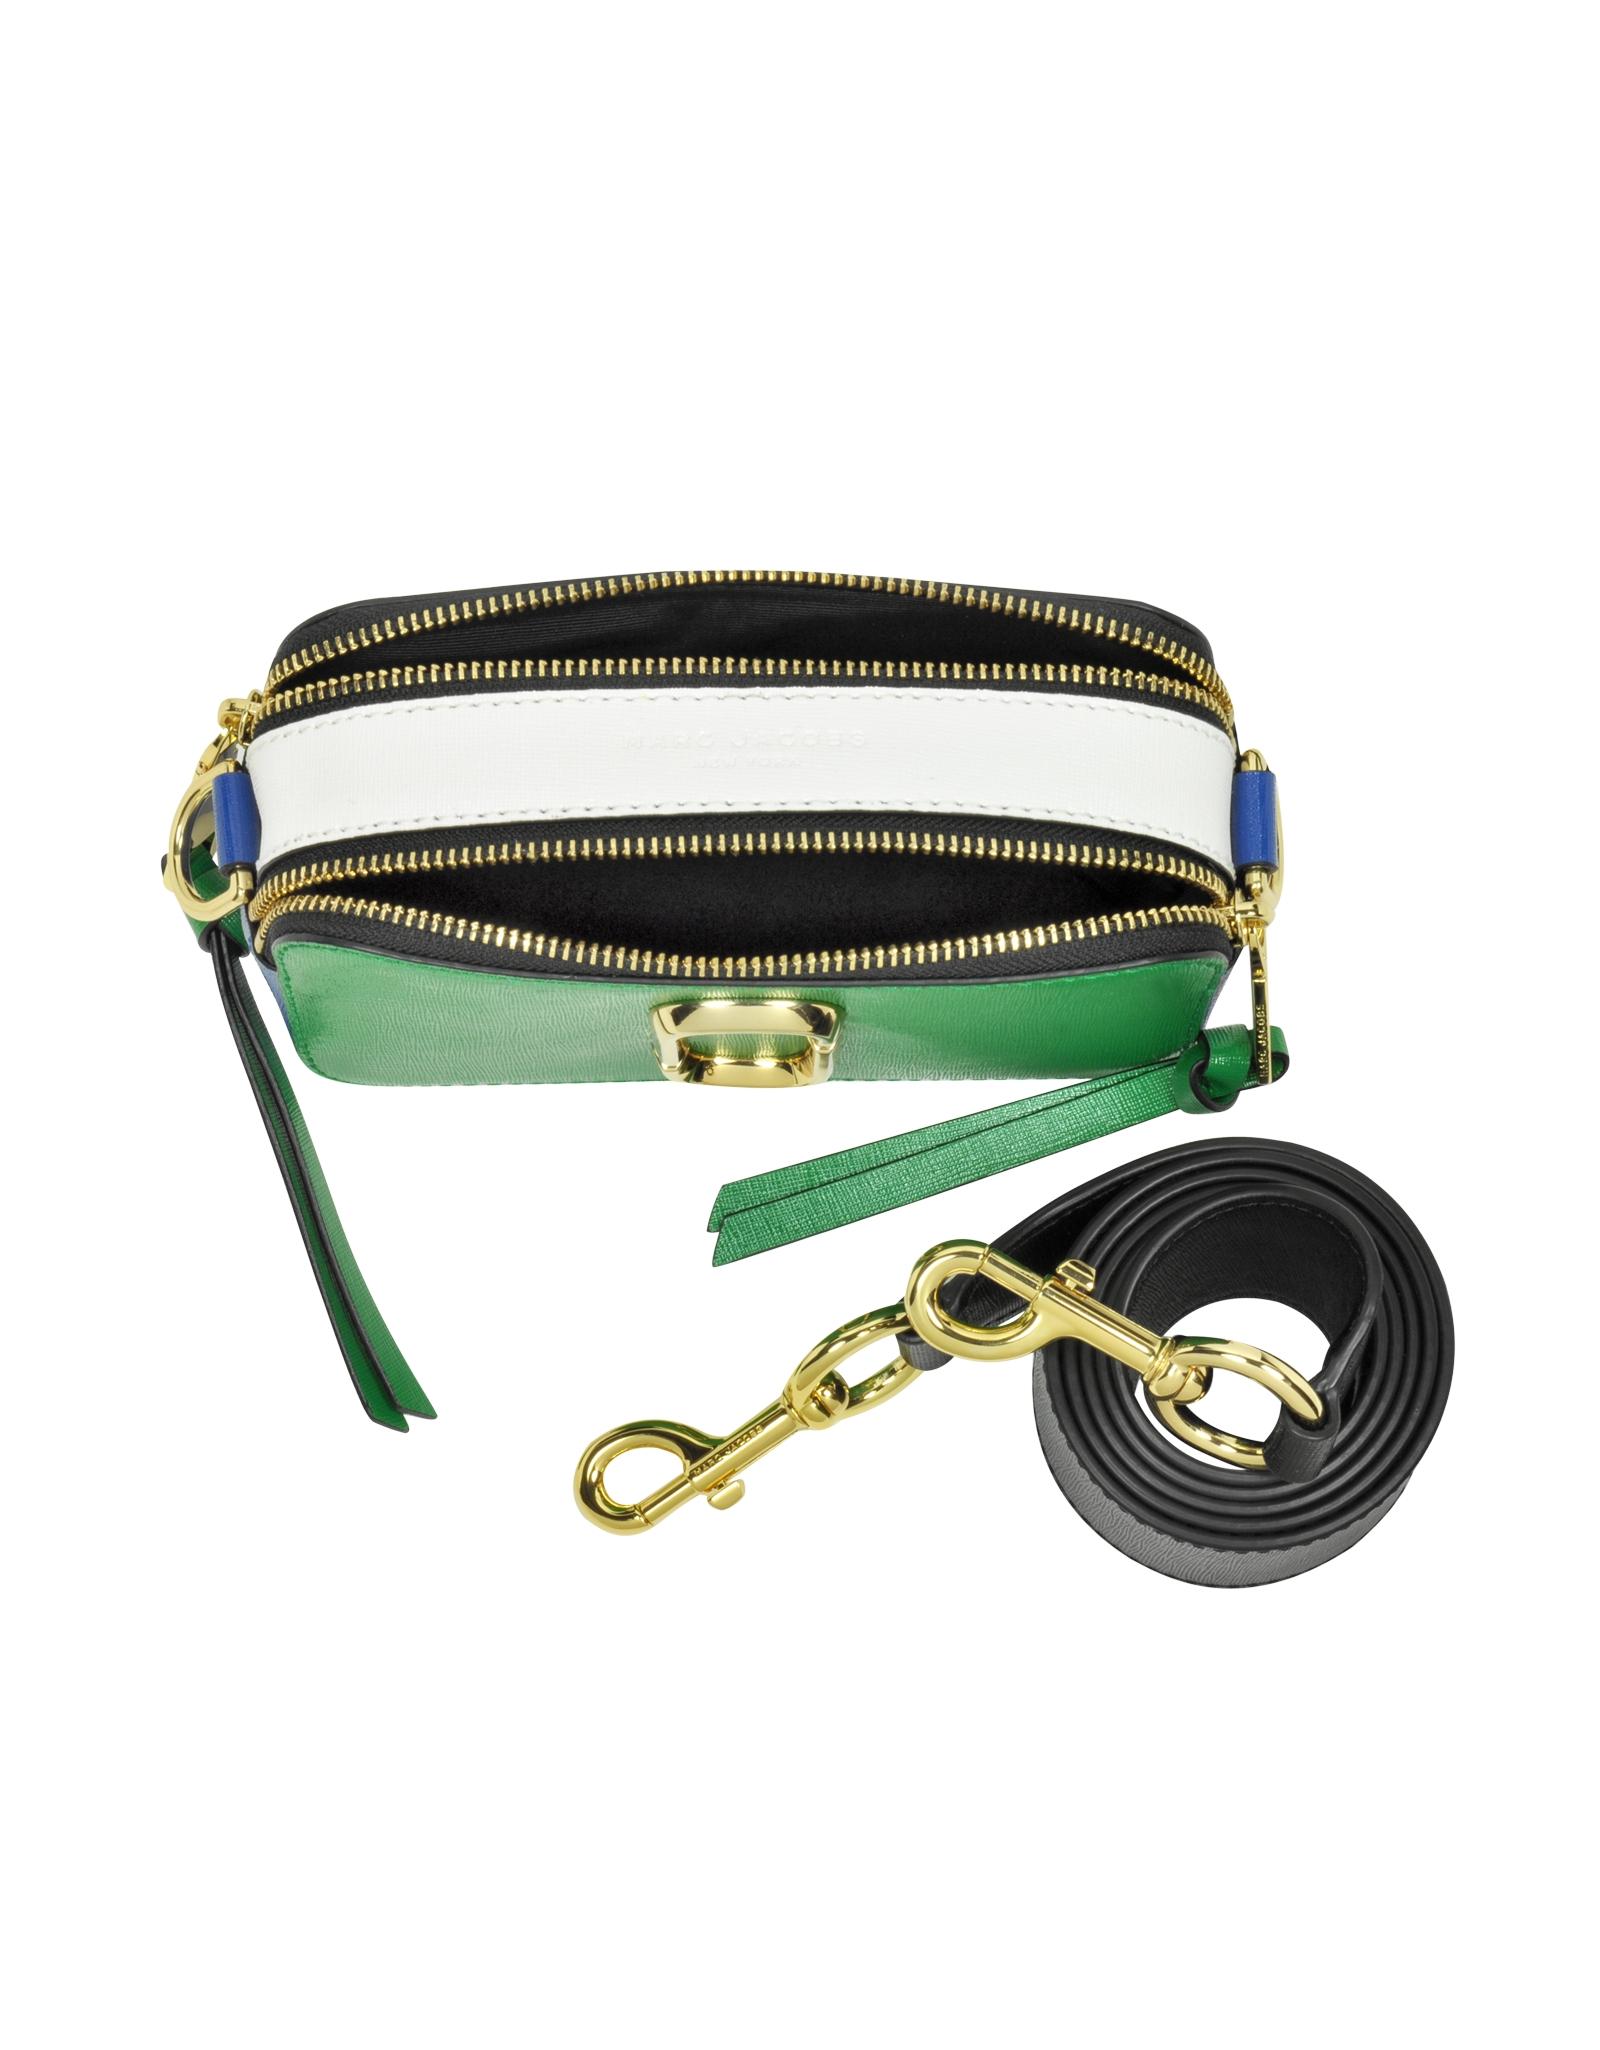 01cbb7af6 Marc Jacobs Snapshot Green Grass Saffiano Leather Small Camera Bag ...